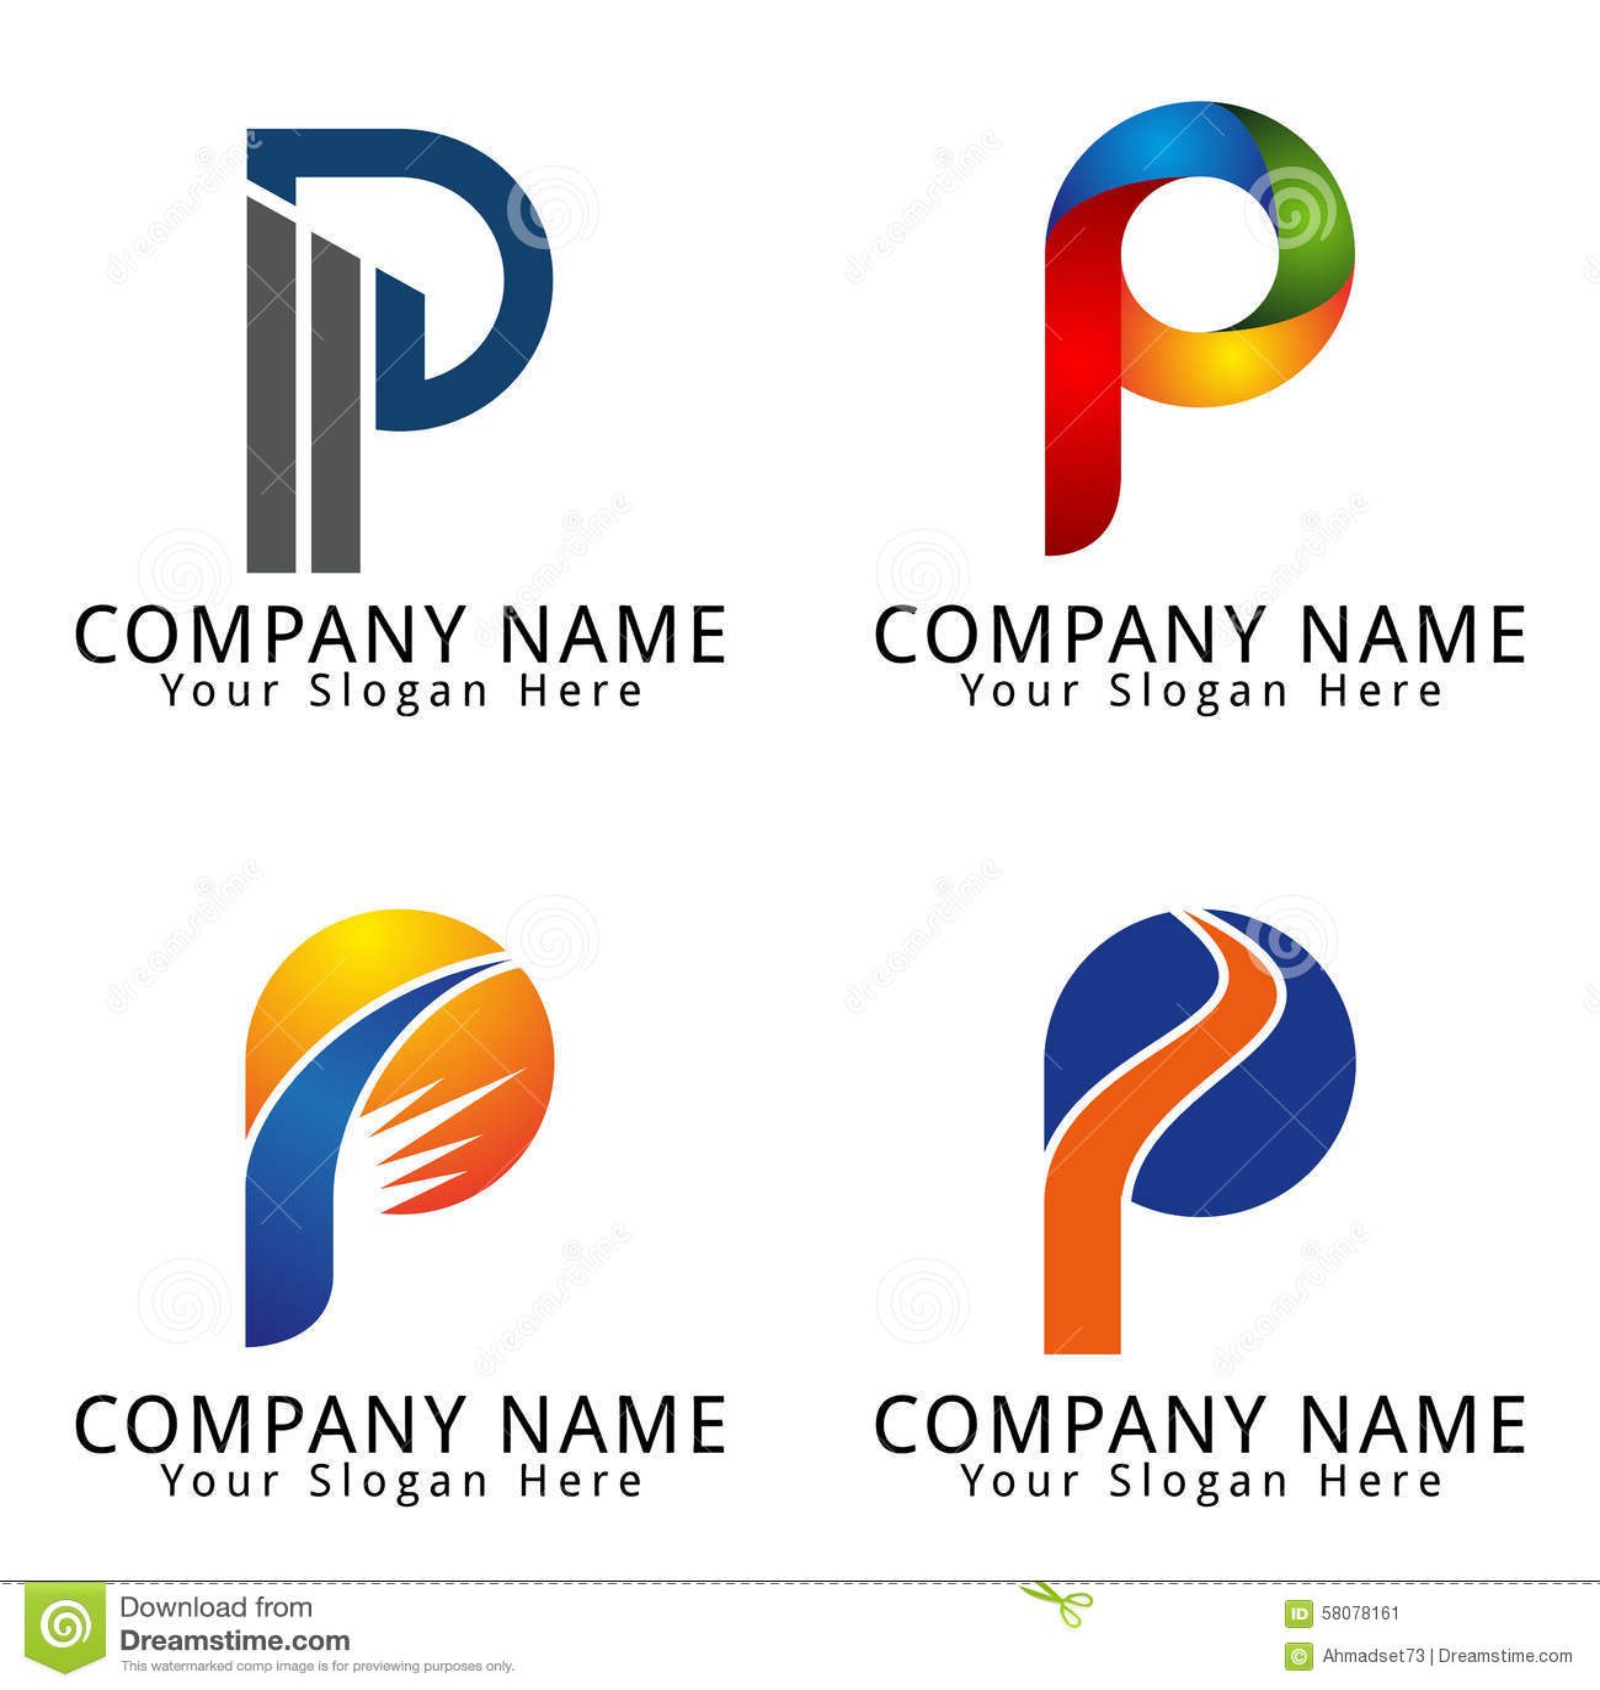 P Design: Stock Image: Elegant Letter P Concept Logo. Image: 58078161